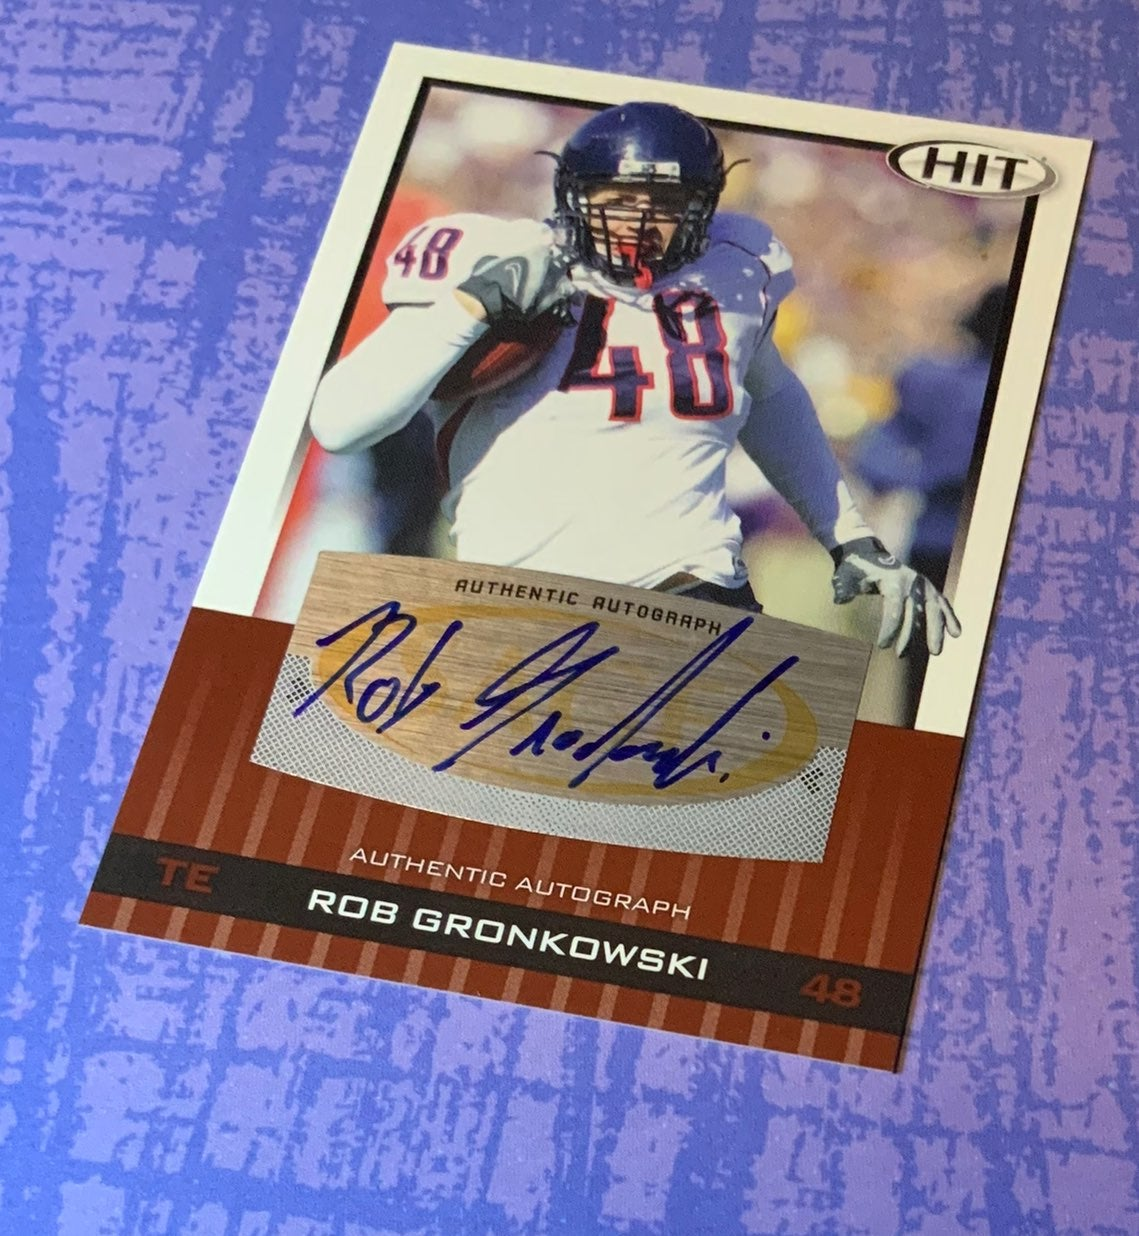 Rob gronkowski sage 2010 card